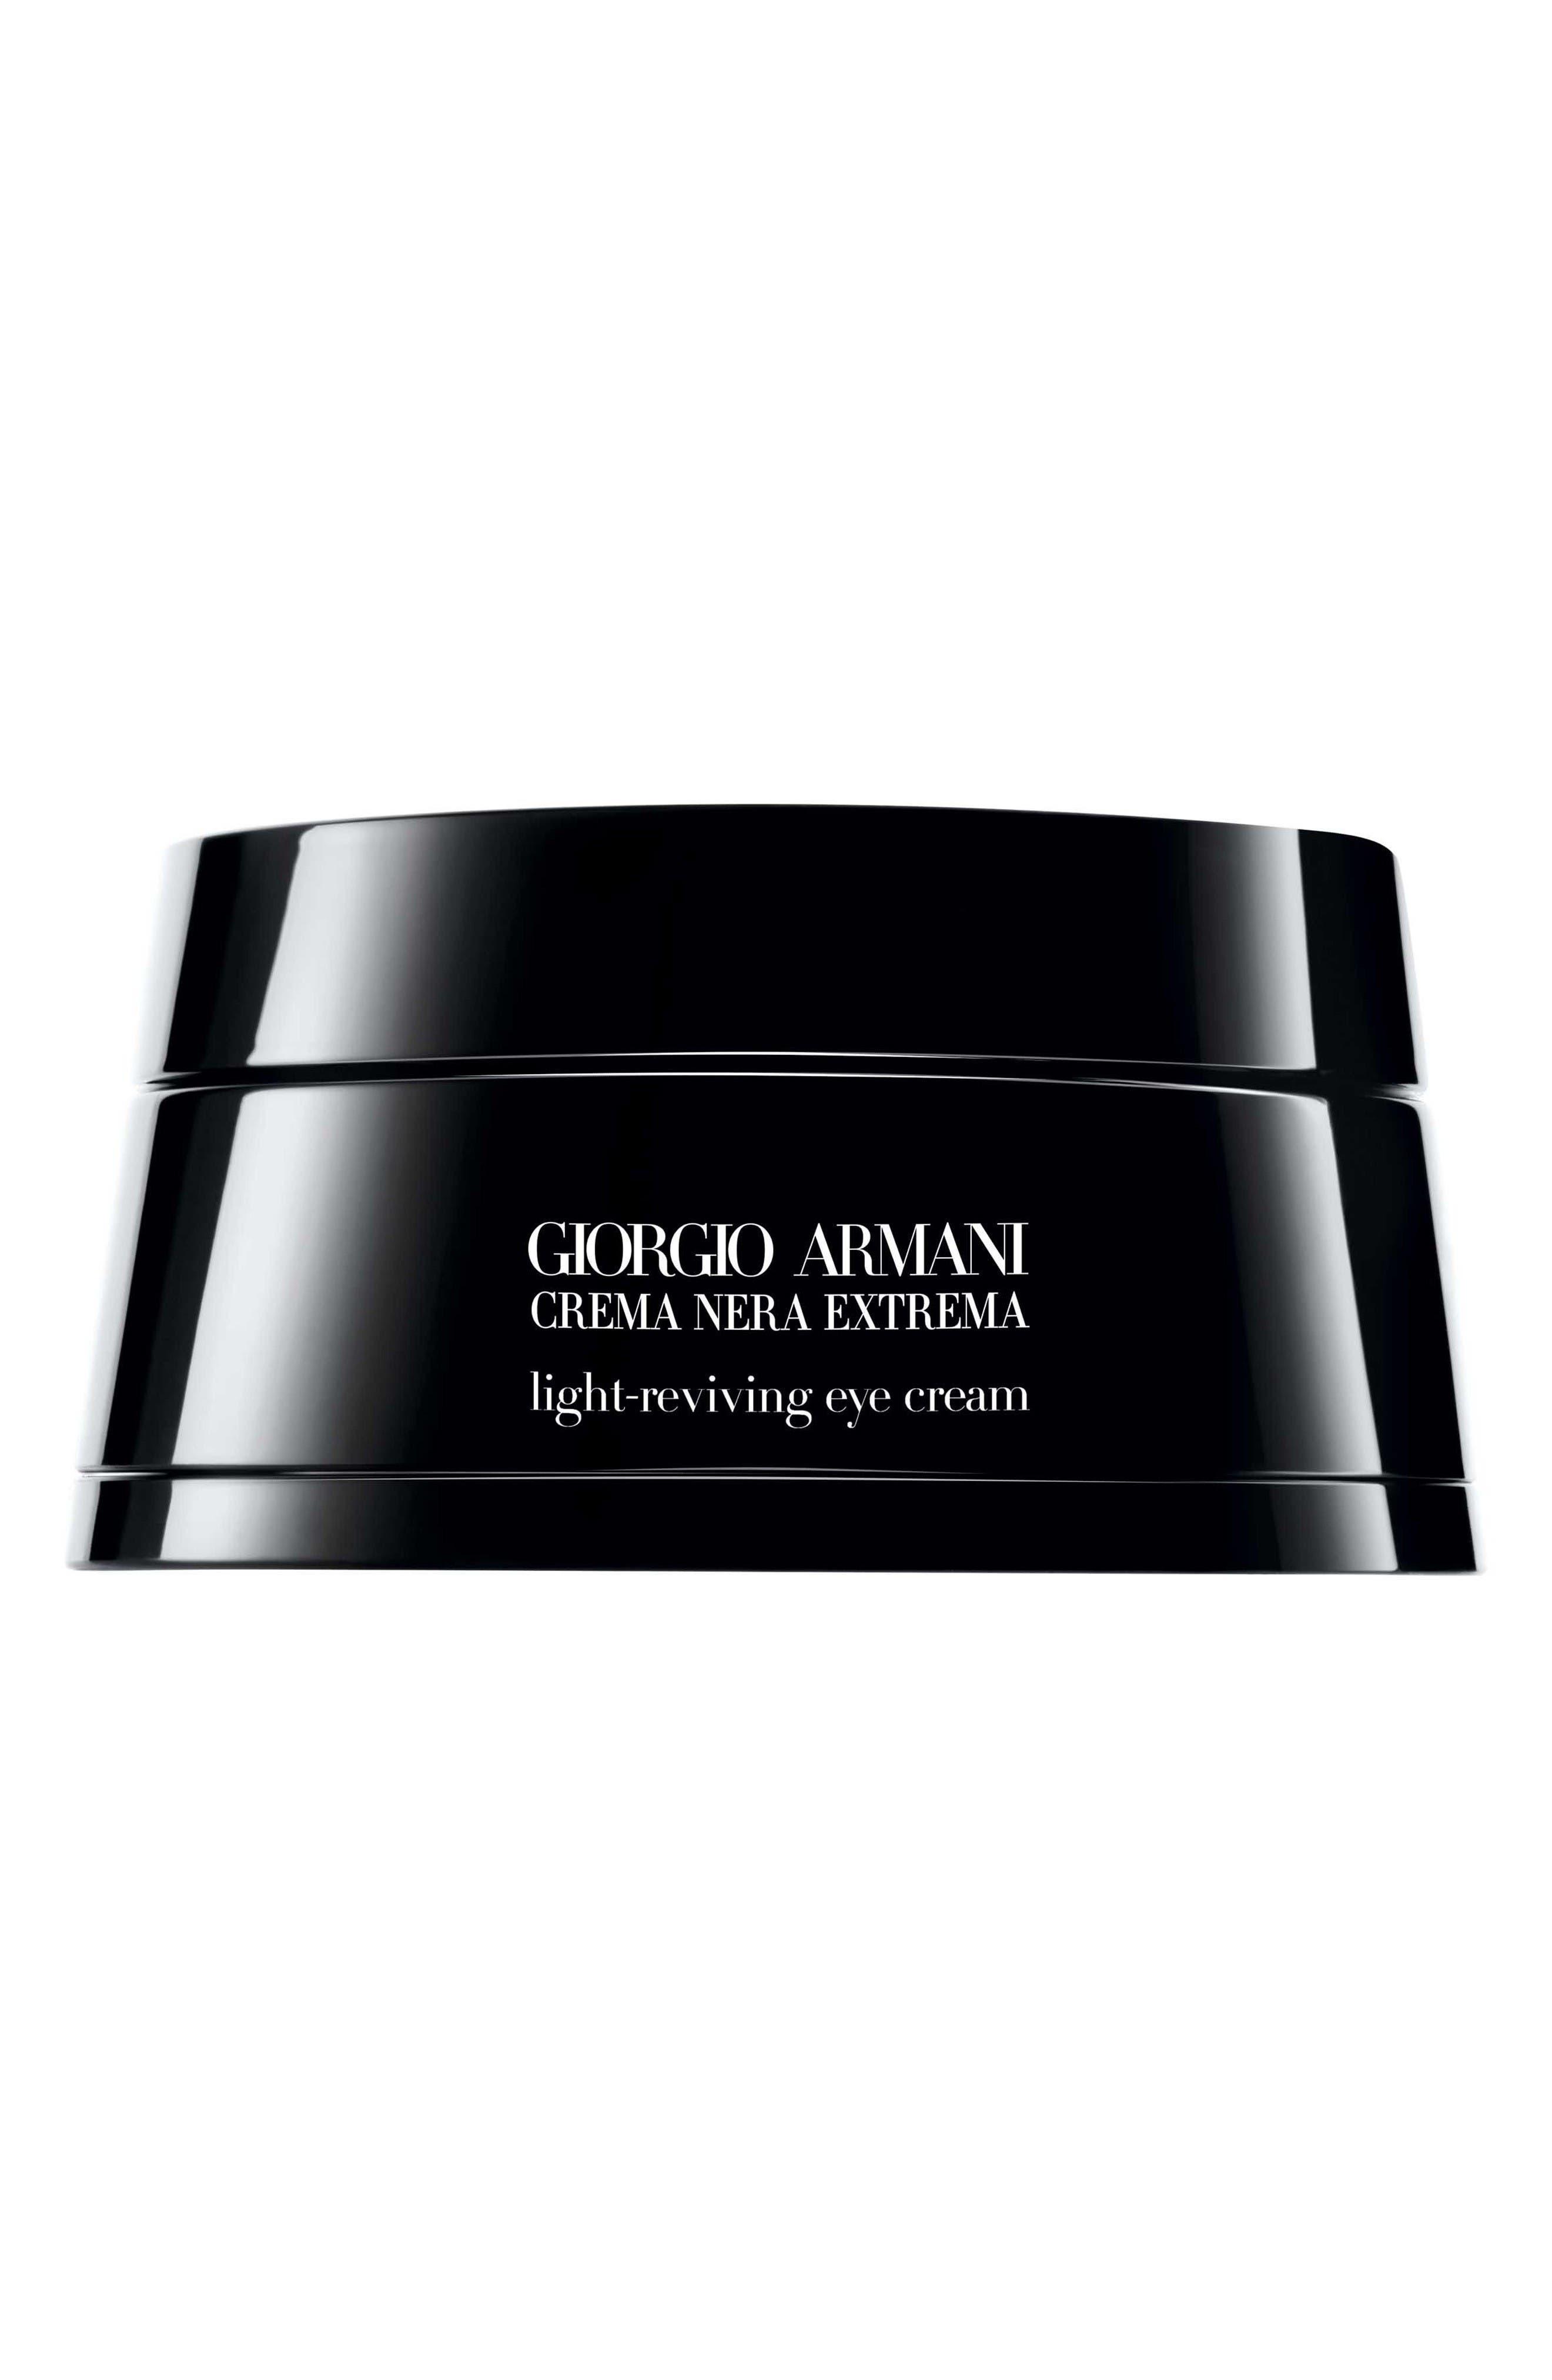 Alternate Image 1 Selected - Giorgio Armani Crema Nera Extrema Light-Reviving Eye Cream